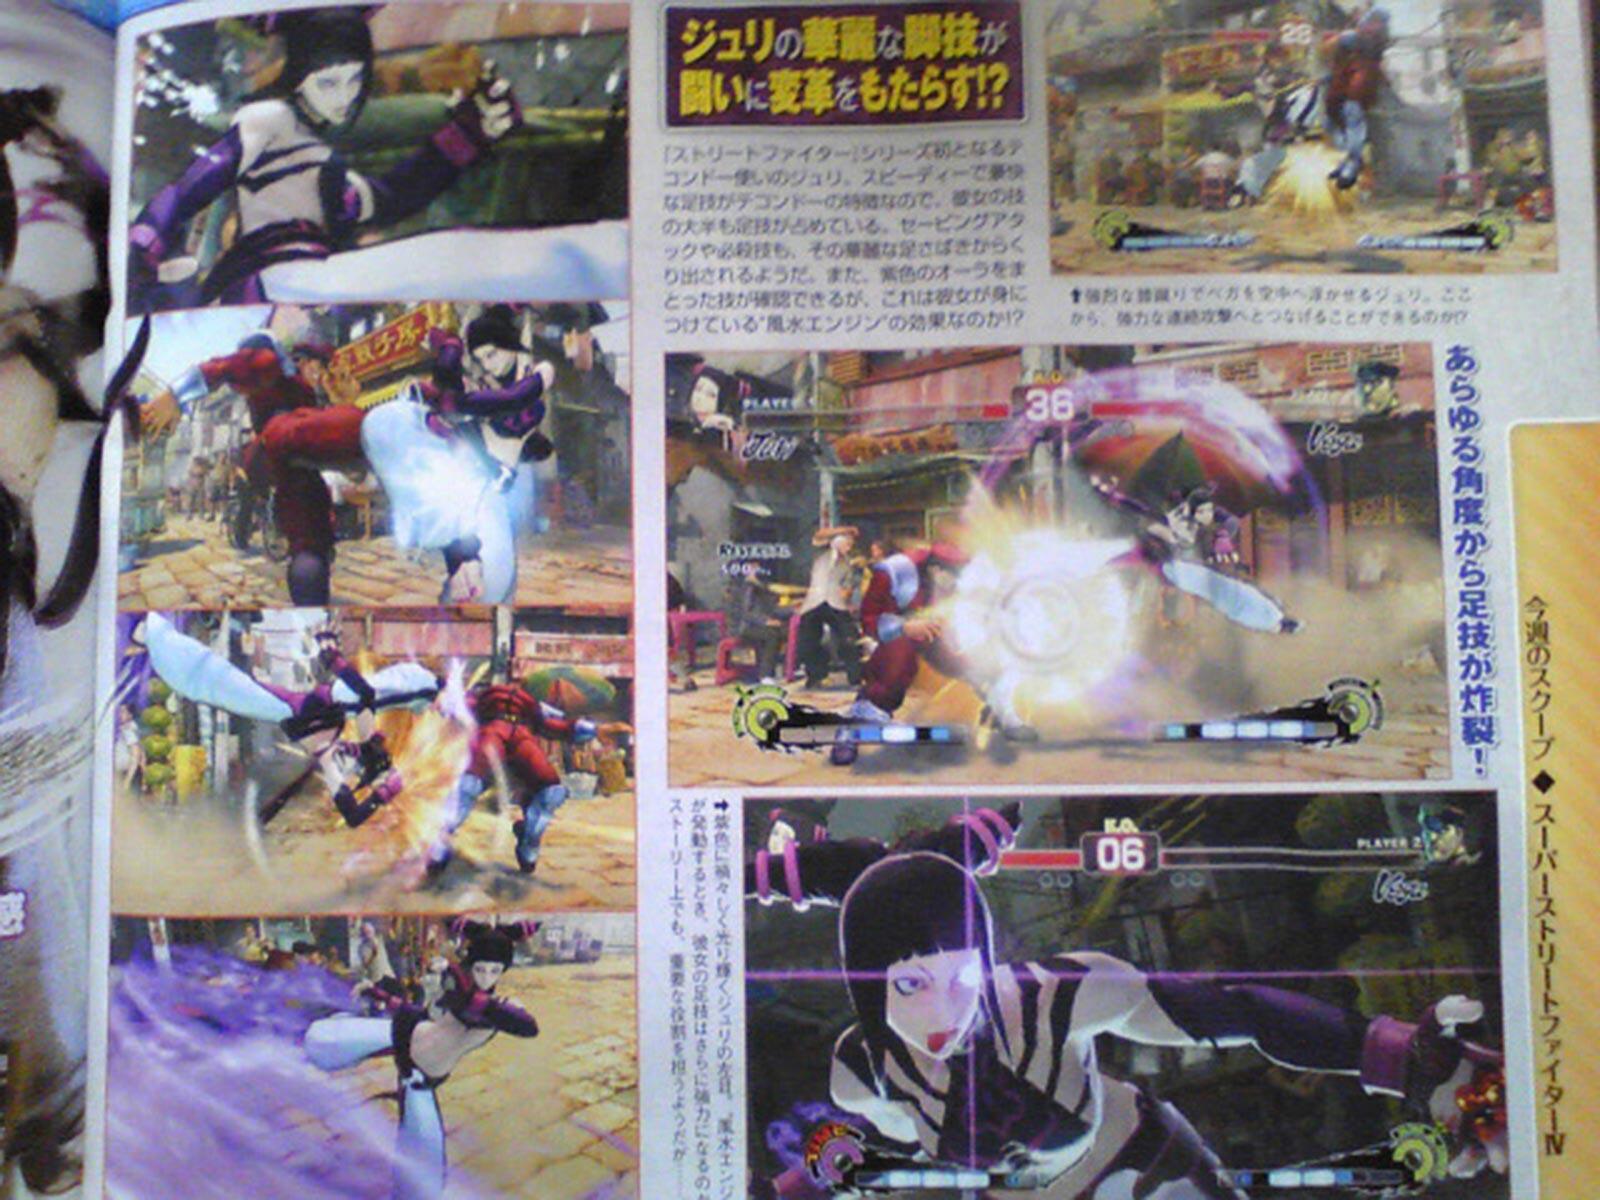 Famitsu scan showing Juri in Super Street Fighter 4